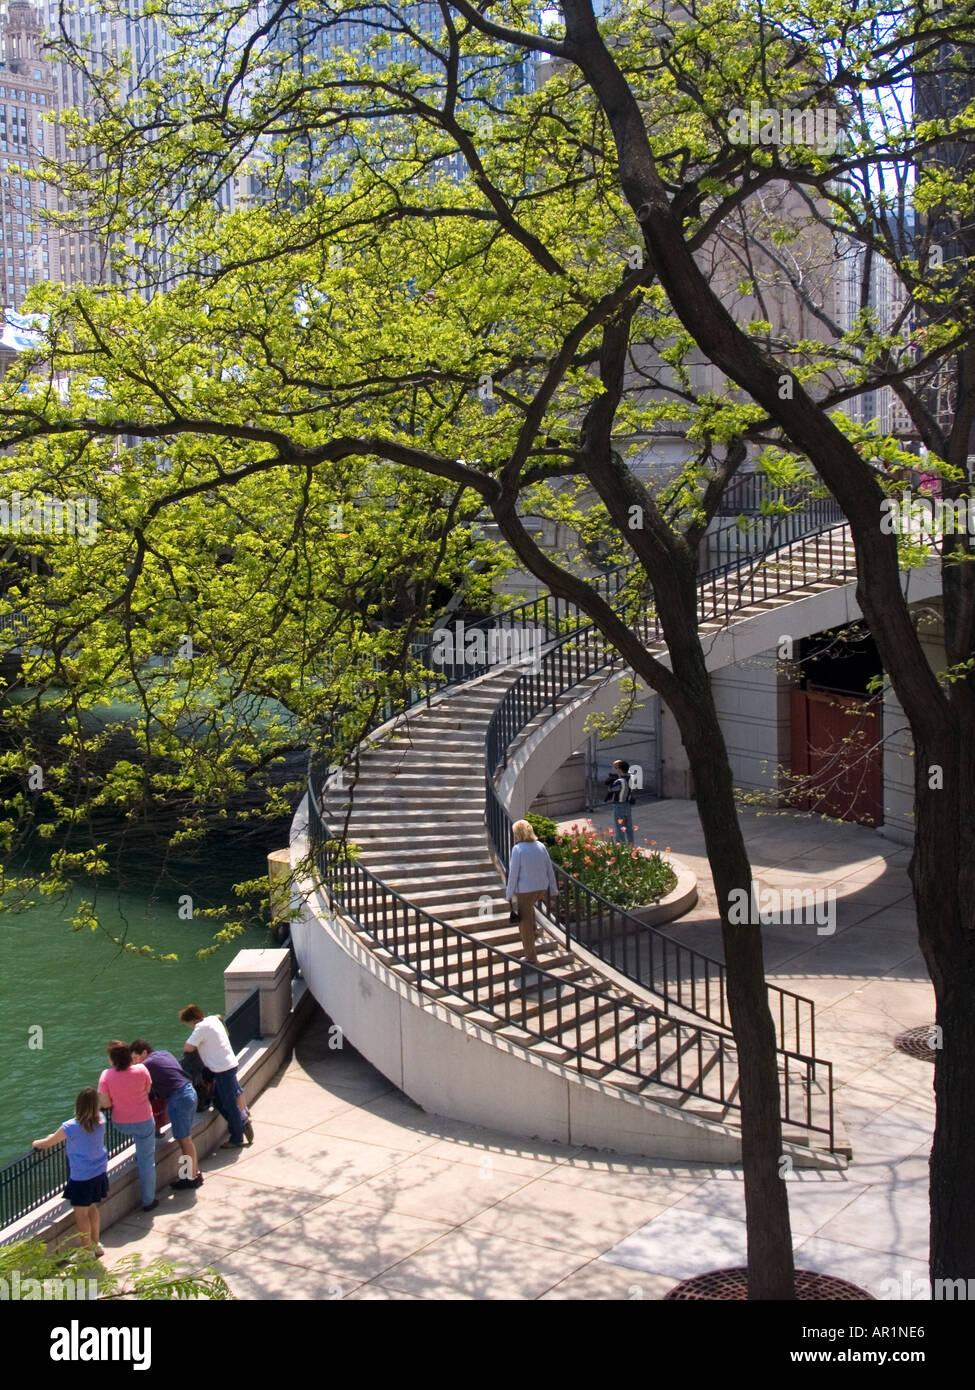 Spiral Staircase Riverwalk Chicago River Near Michigan Avenue